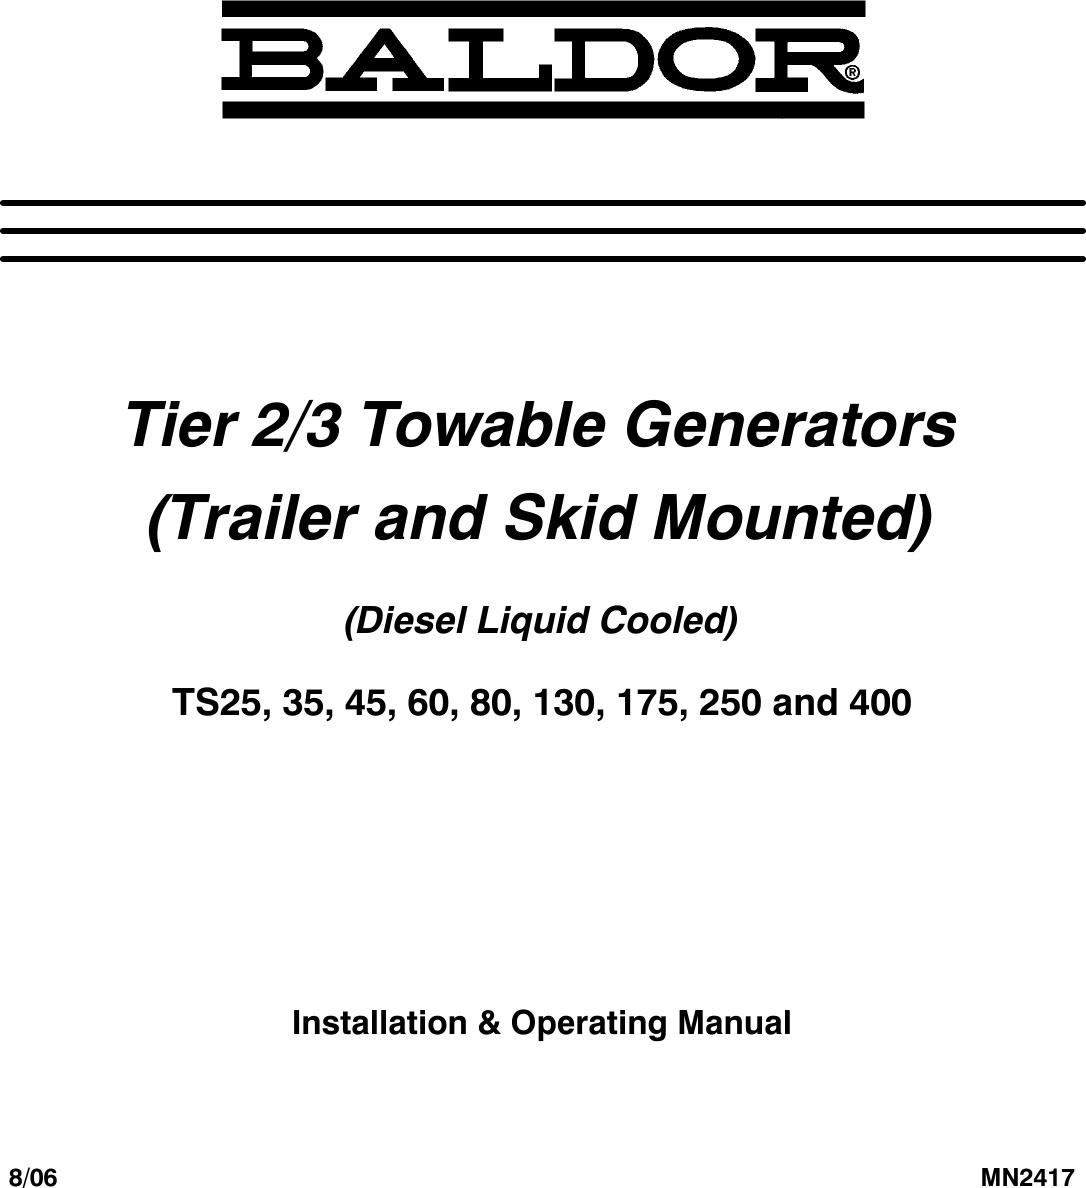 baldor ts25 installation manual manualslib makes it easy to find rh usermanual wiki Single Phase Capacitor Motor Wiring Diagrams Reliance DC Motor Wiring Diagram